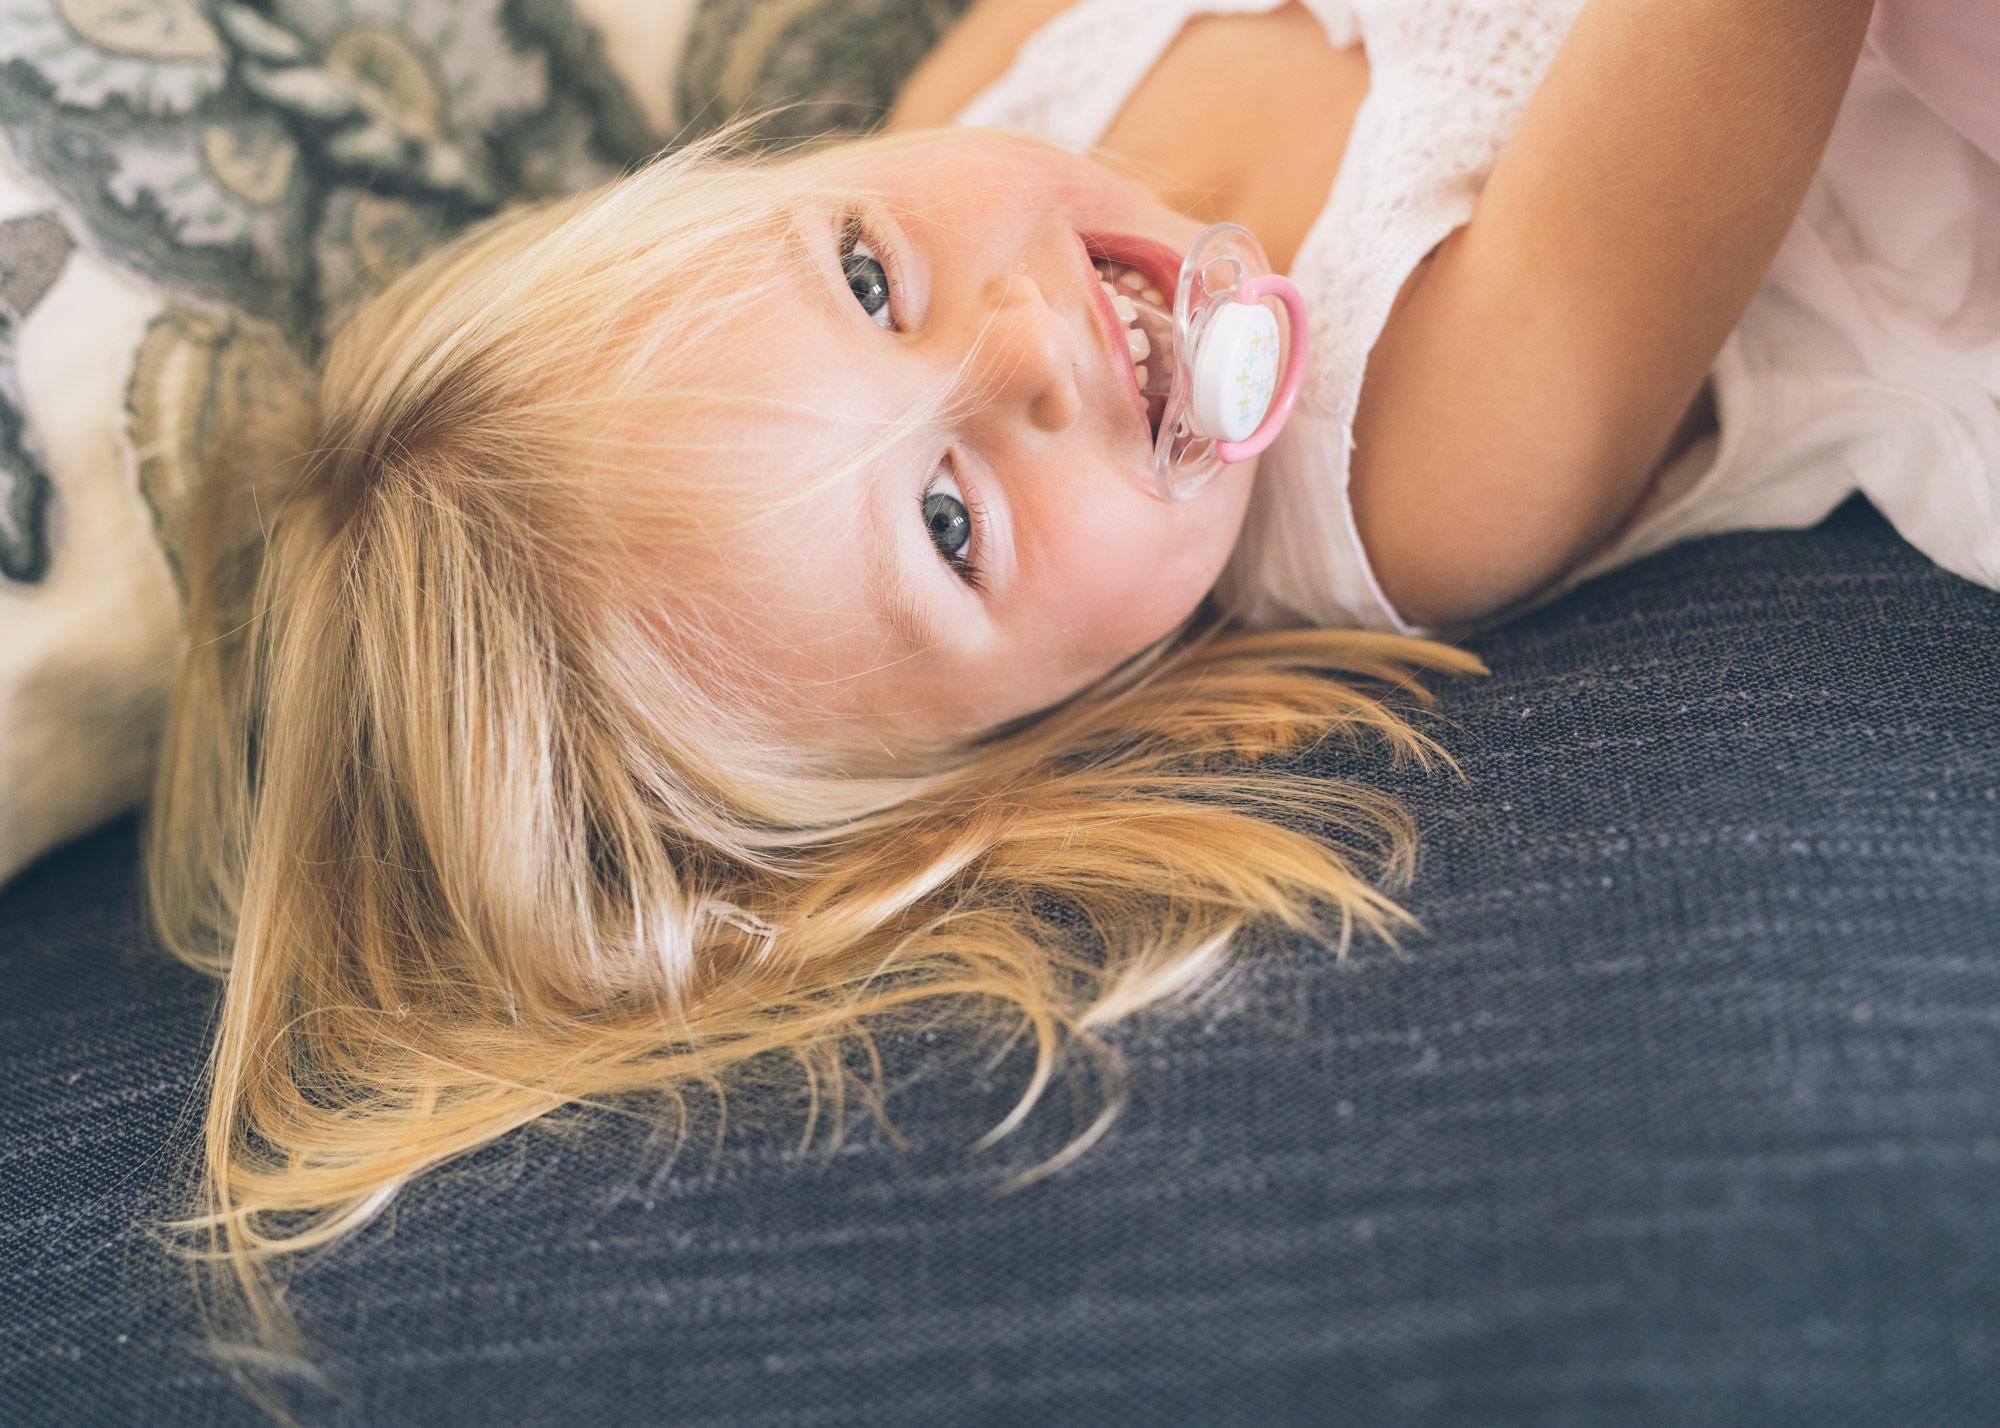 toddler-girl-smiling-during-a-family-photoshoot.jpg